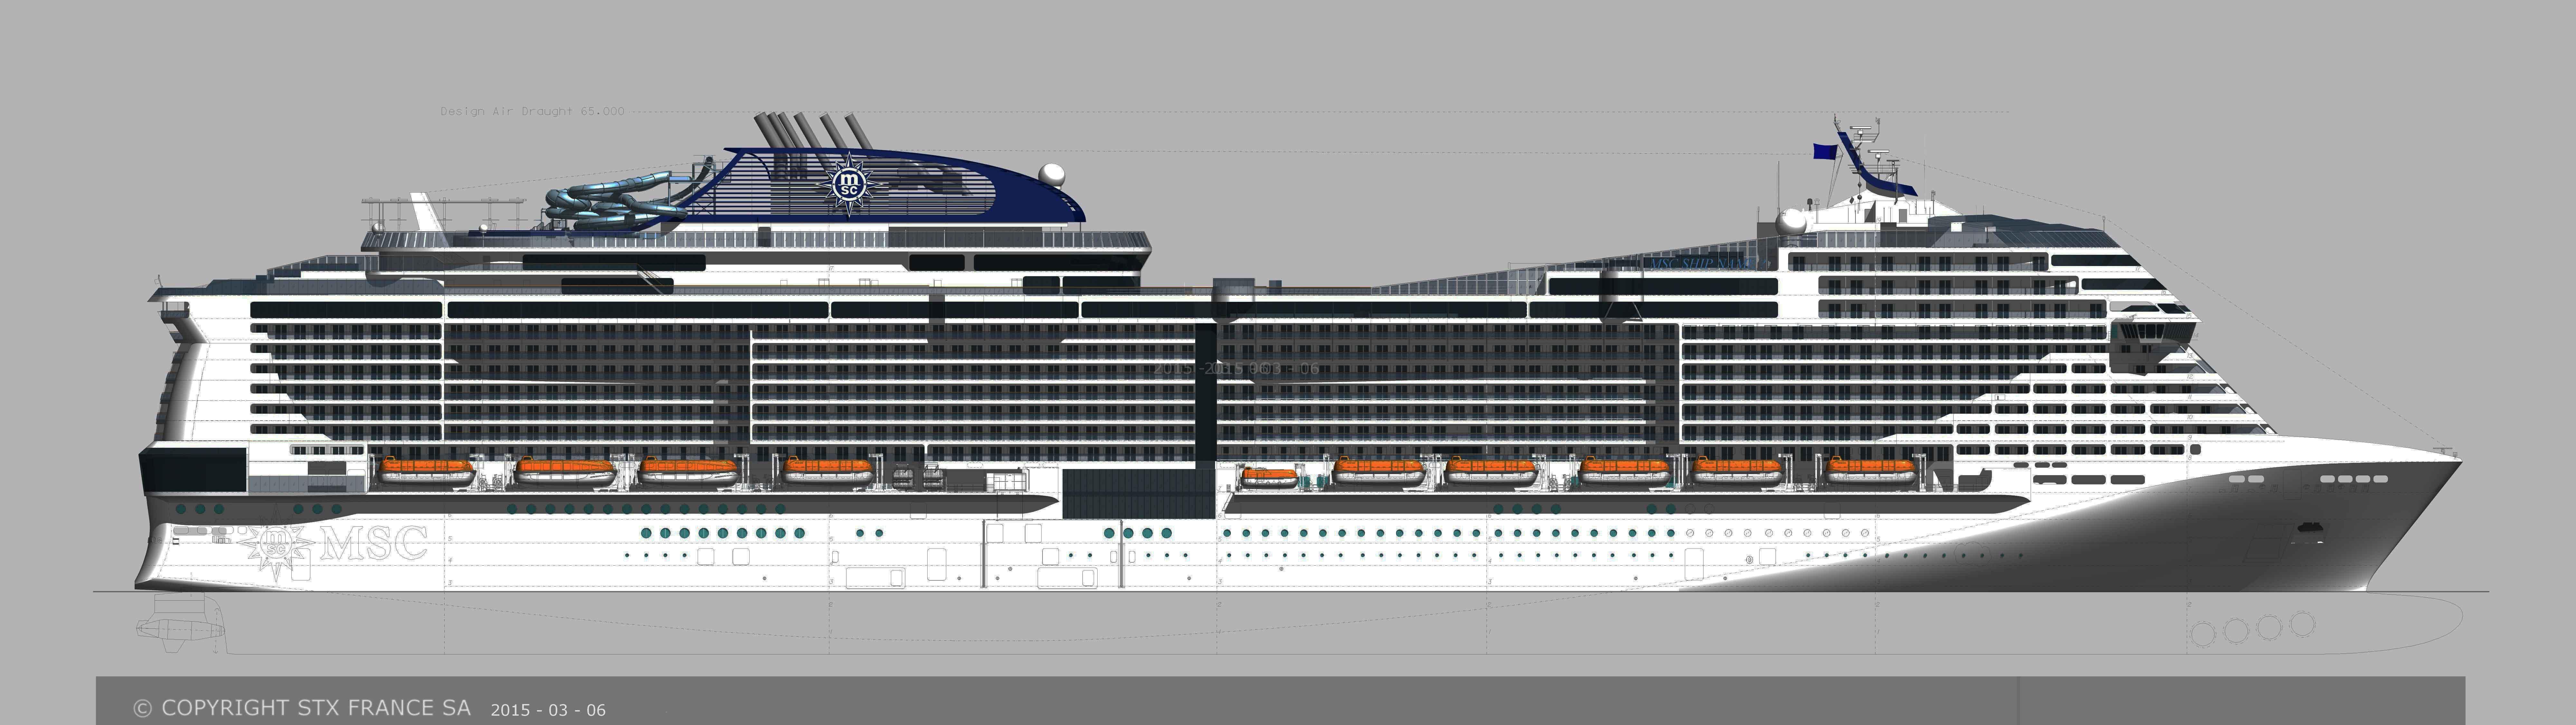 Msc Cruises First Next Generation Ship Named Msc